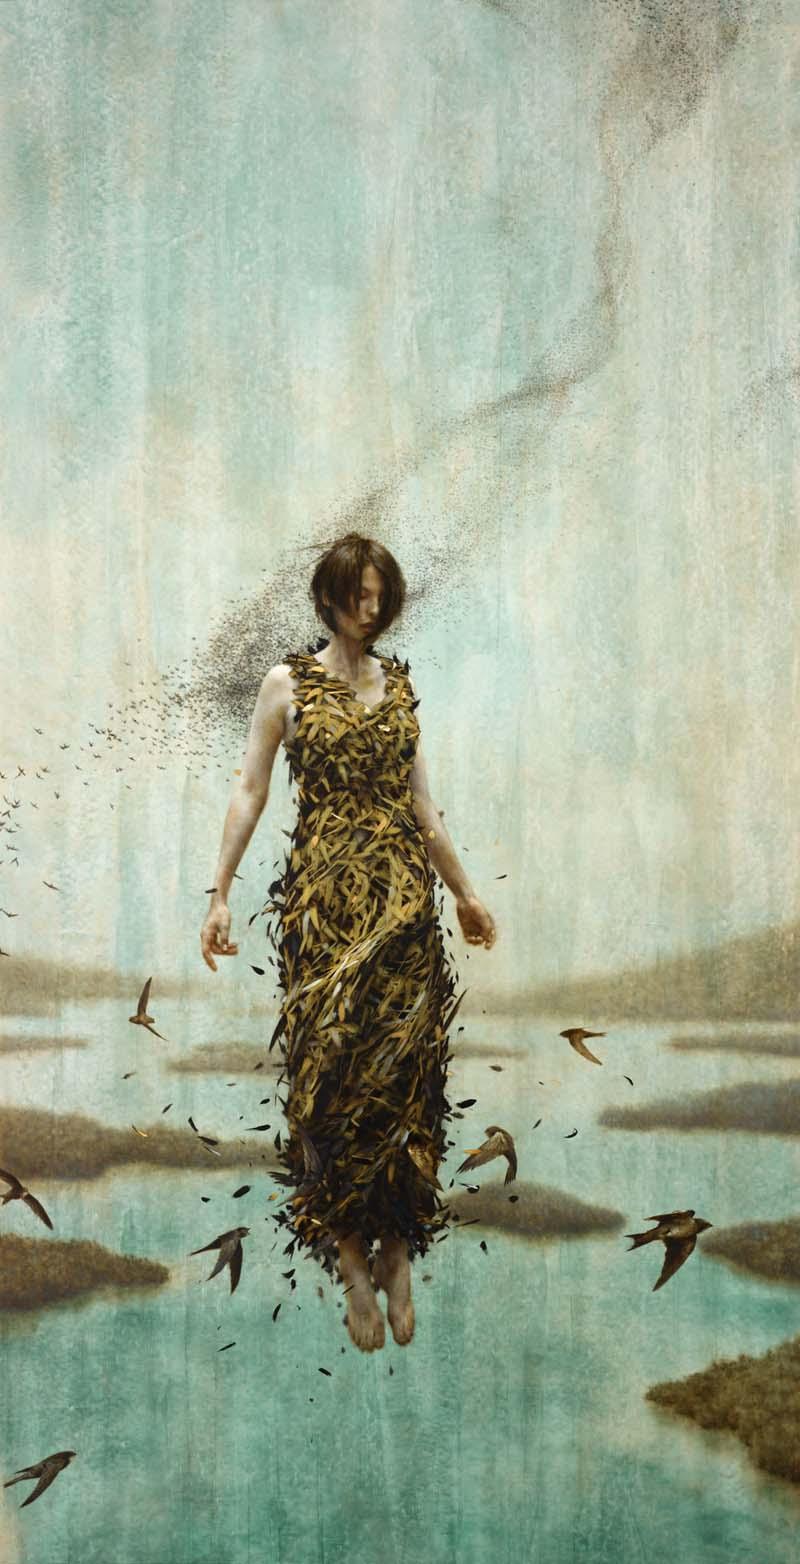 Artist Spotlight - Brad Kunkle 16